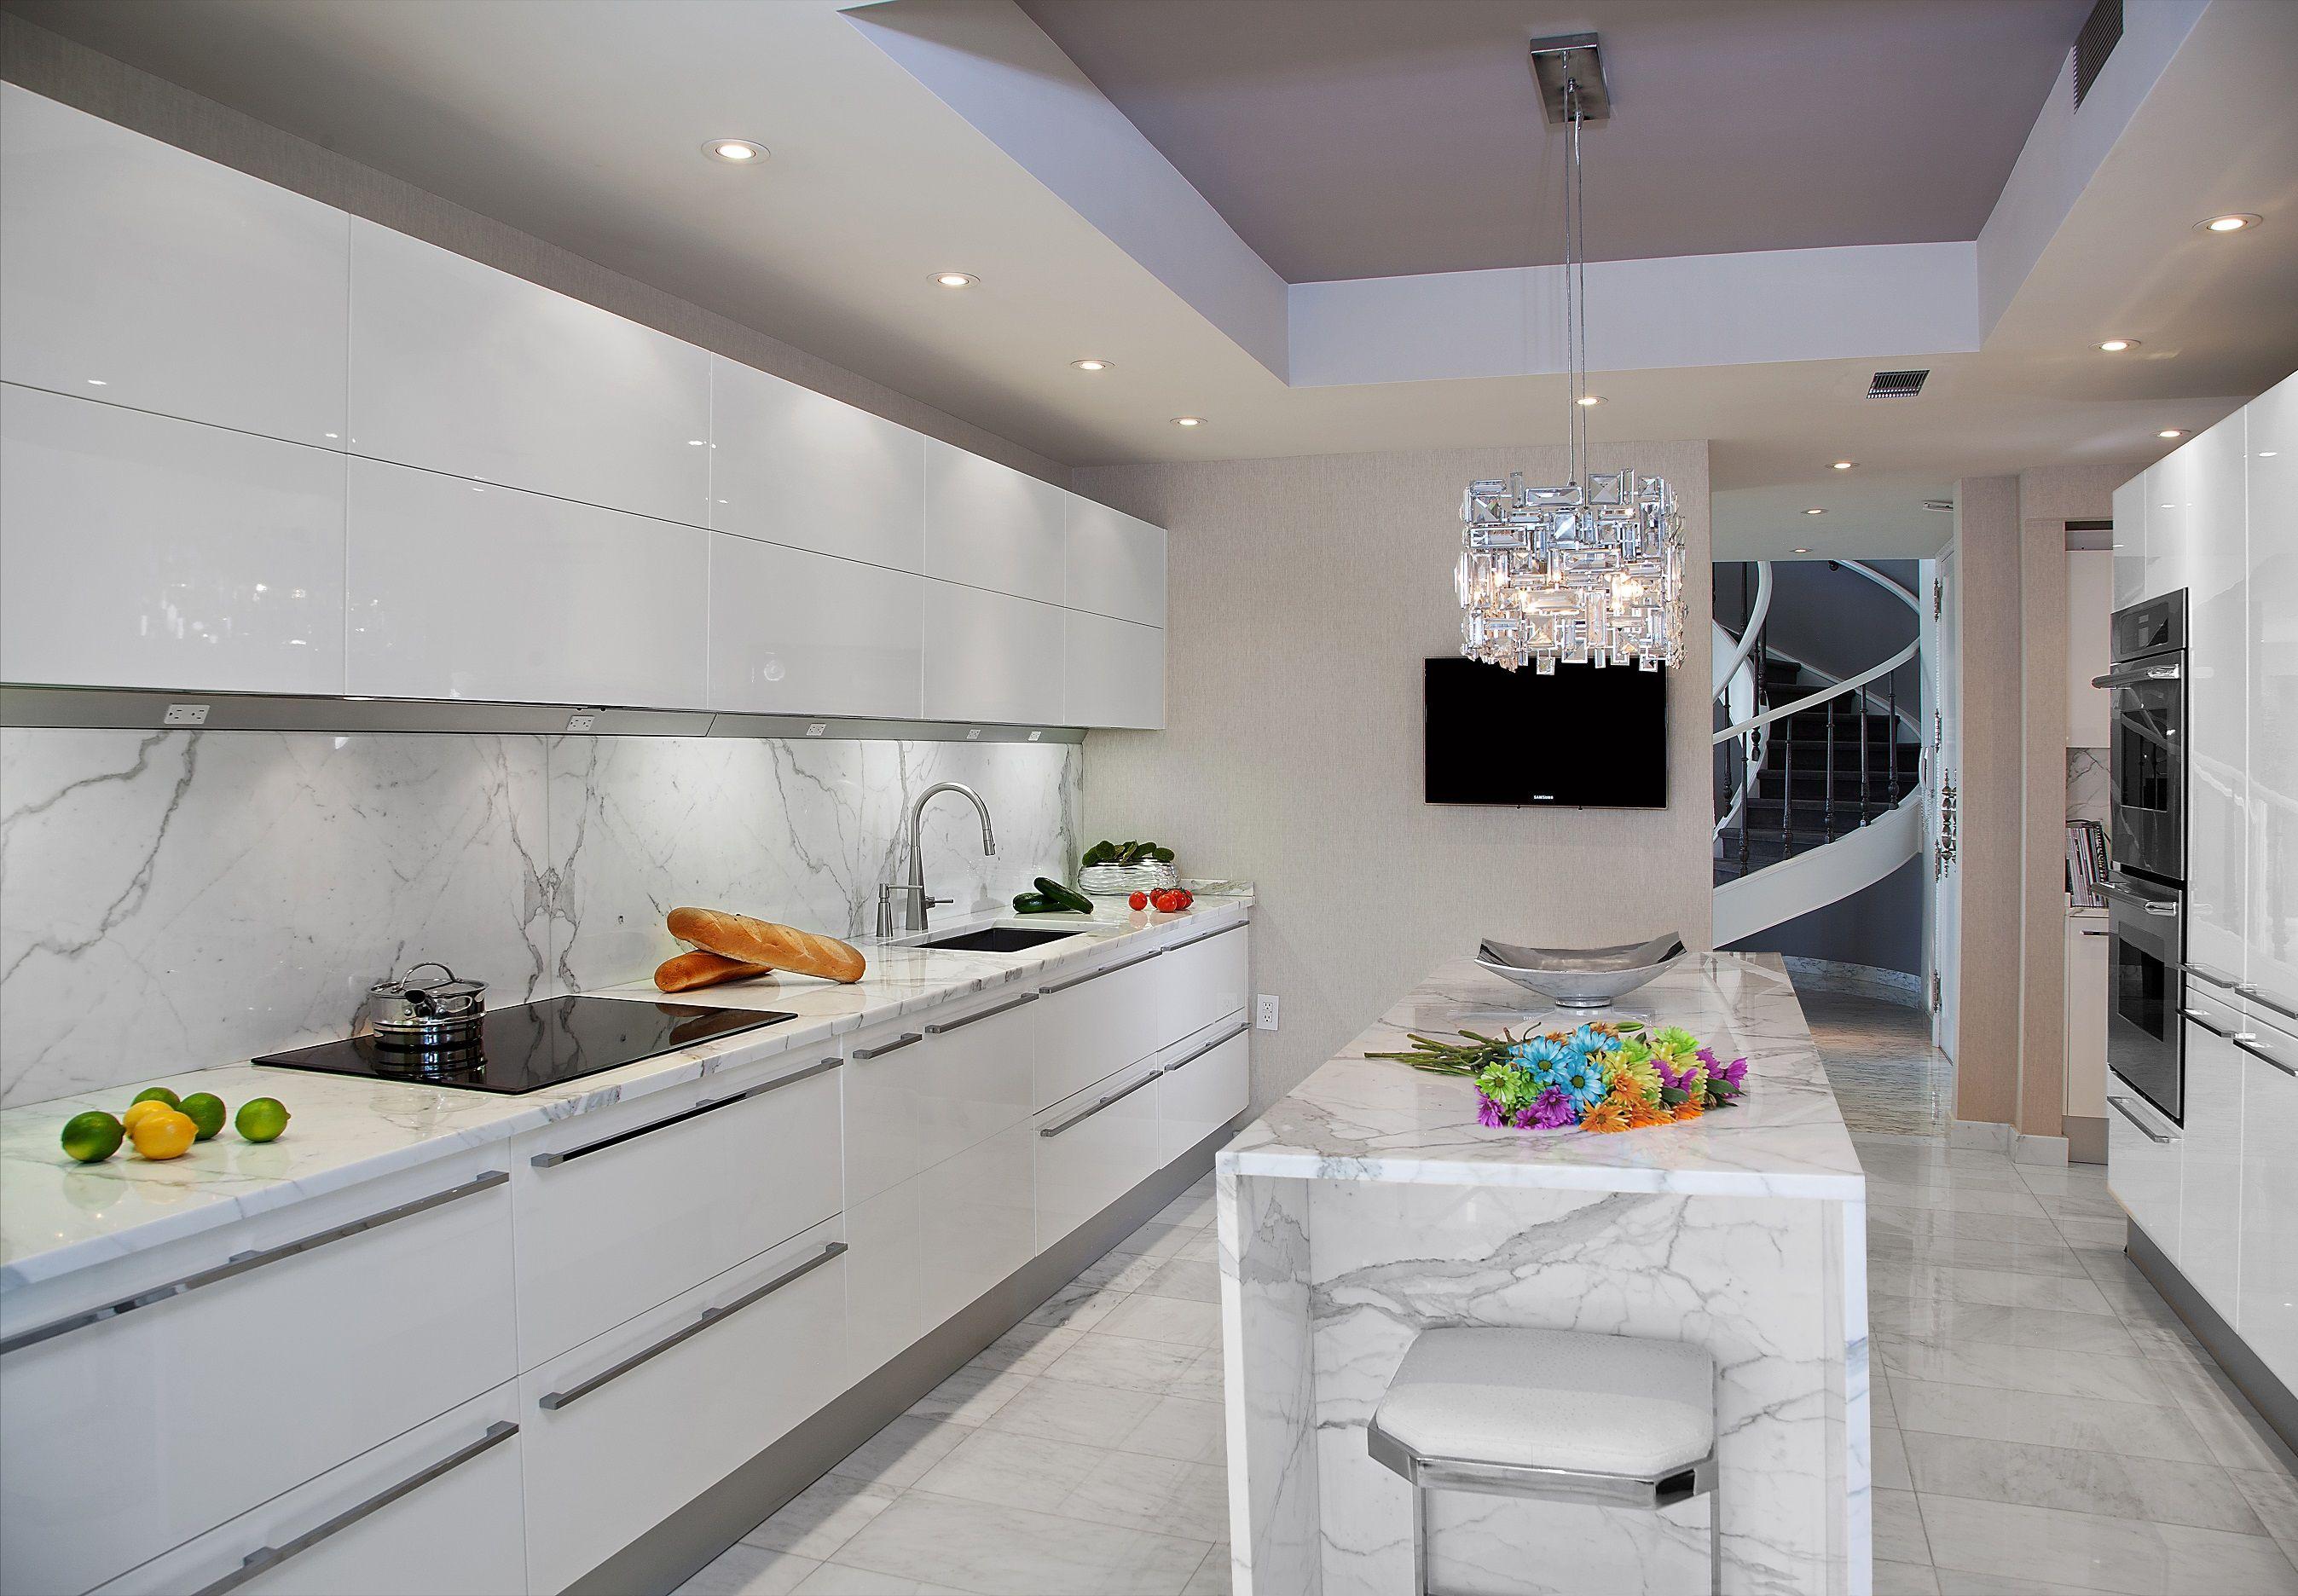 Modern Kitchen Designed By Kuche Cucina From Paramus Nj Pedini High Gloss Cabinets Calacatt White Modern Kitchen White Marble Kitchen Modern Kitchen Design